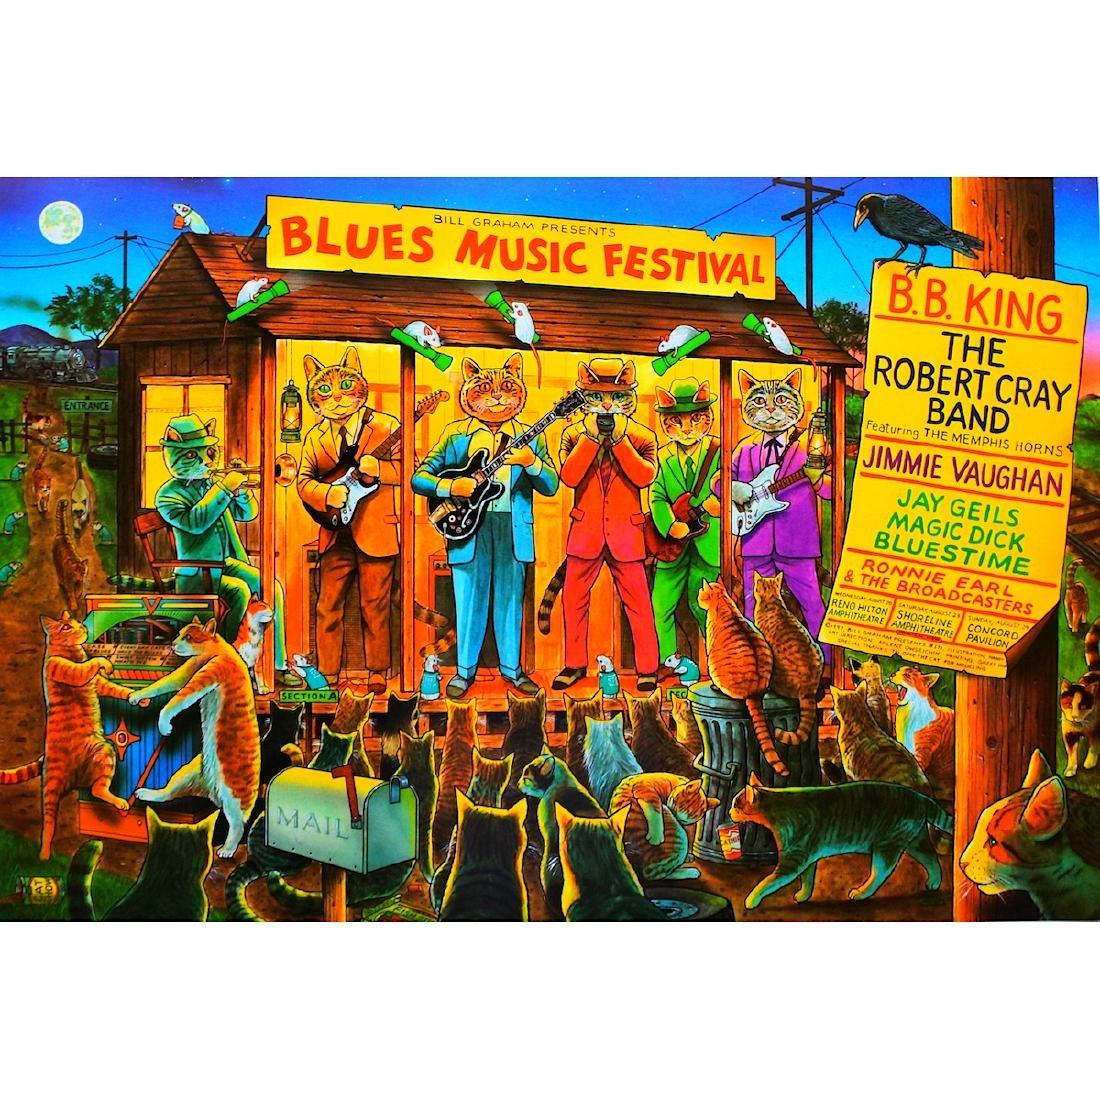 B.B. King - Robert Cray Band - 1997 Concert Poster